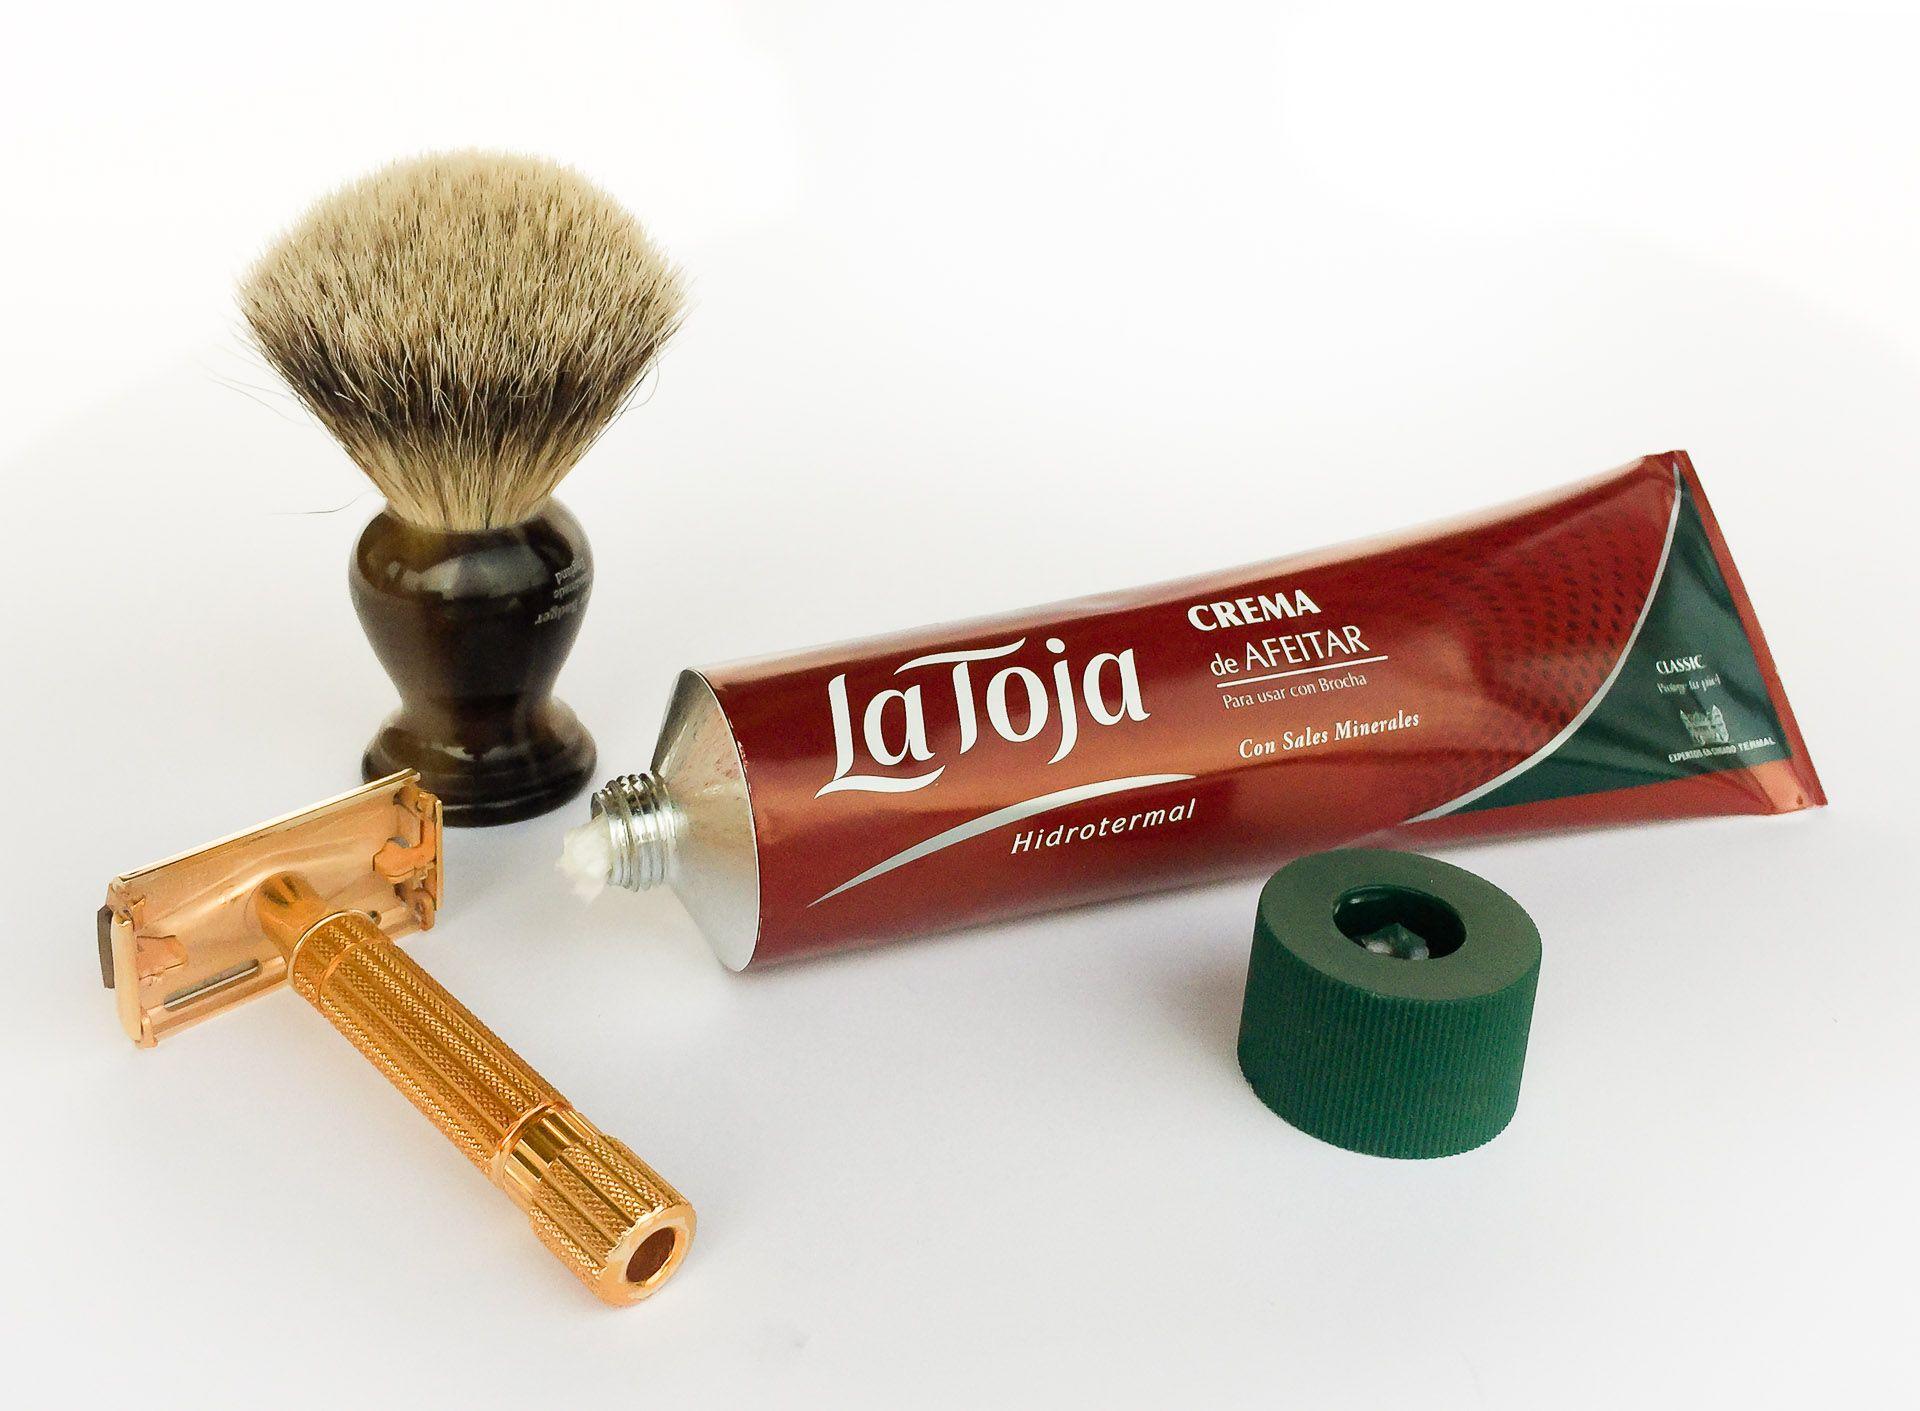 Kremu do golenia La Toja Crema de Afeitar (shaving cream)